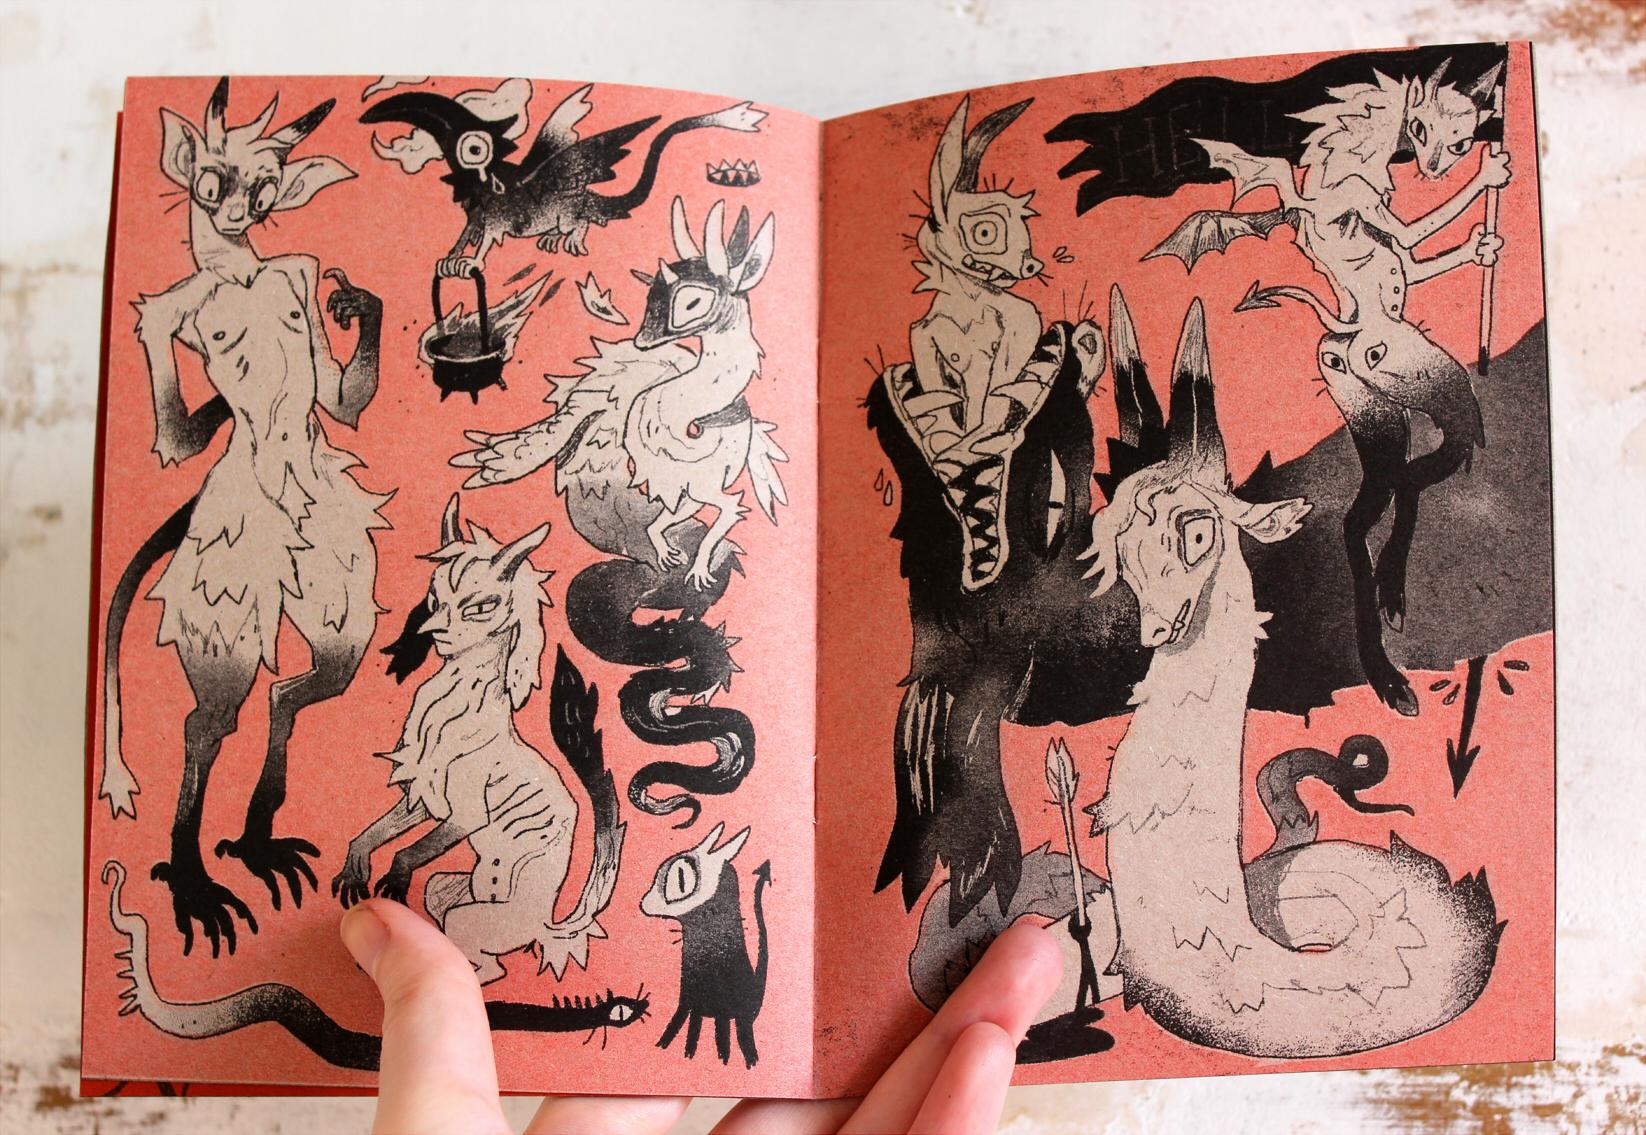 'Infernal' by Eli Spencer & Sophie Robin